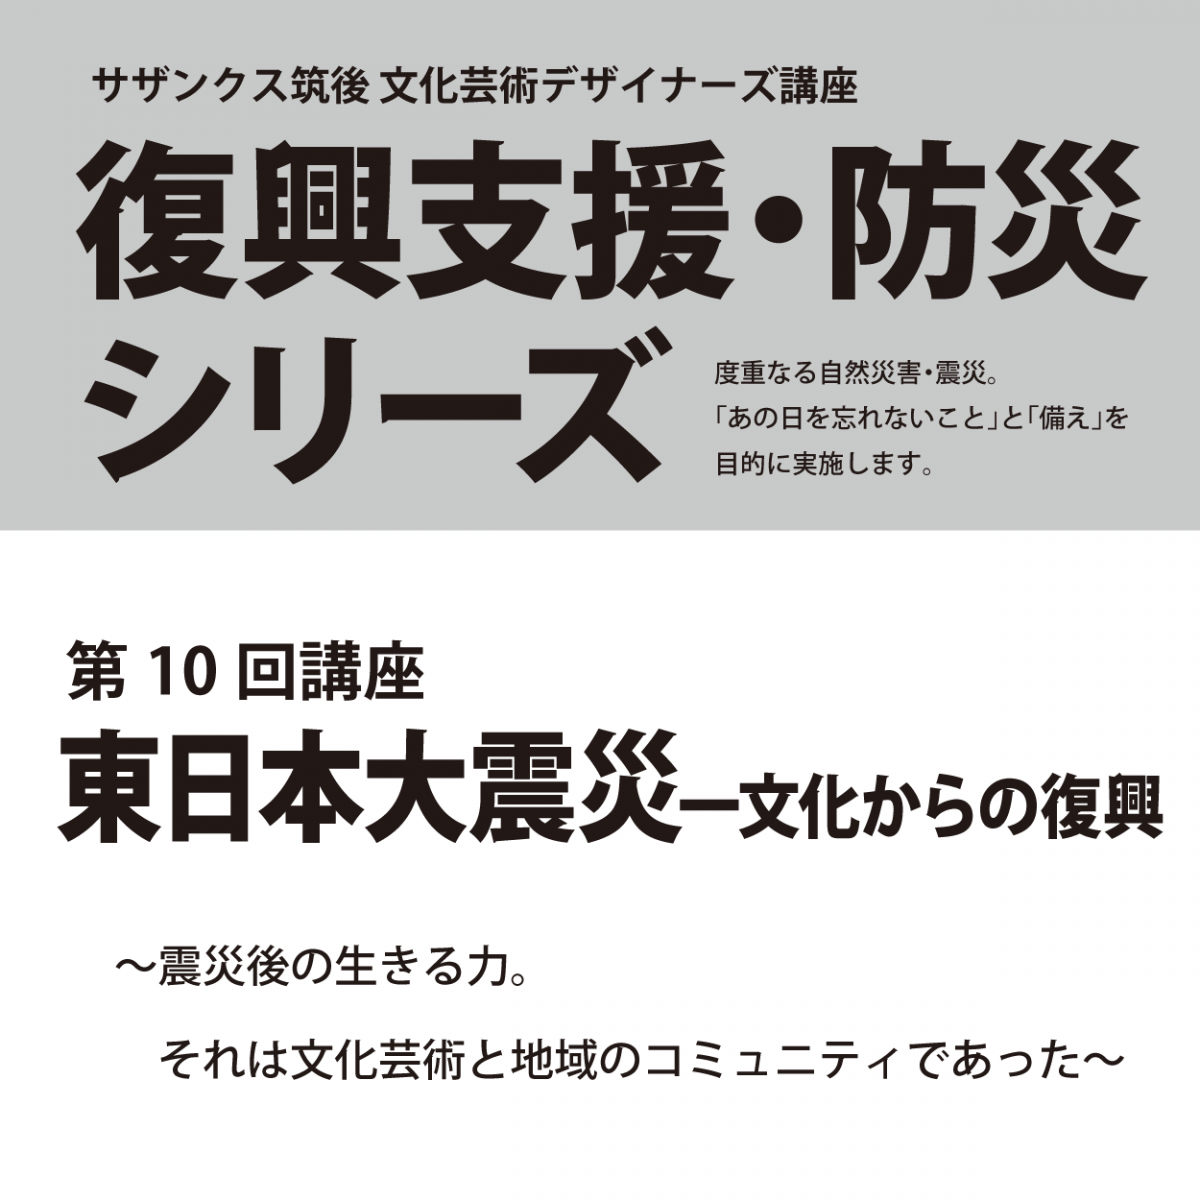 第10回講座「東日本大震災一文化からの復興」